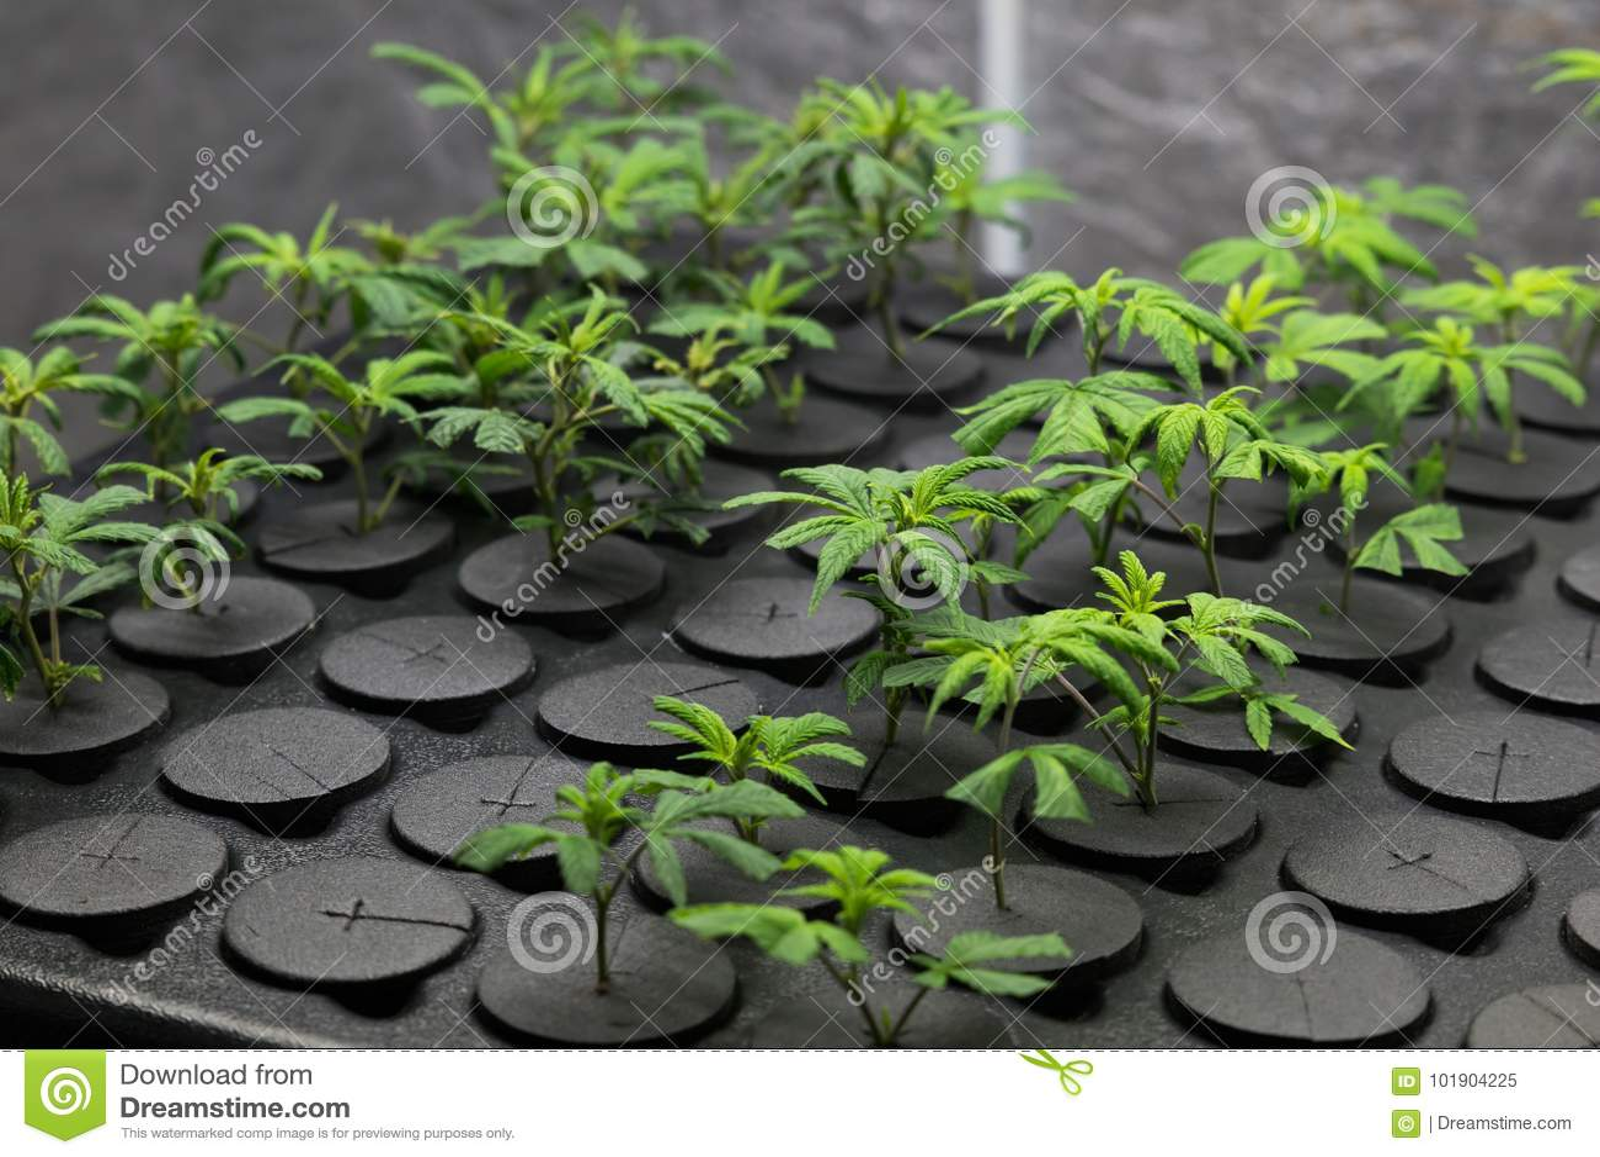 Jeunes clones frais de cannabis de coupe